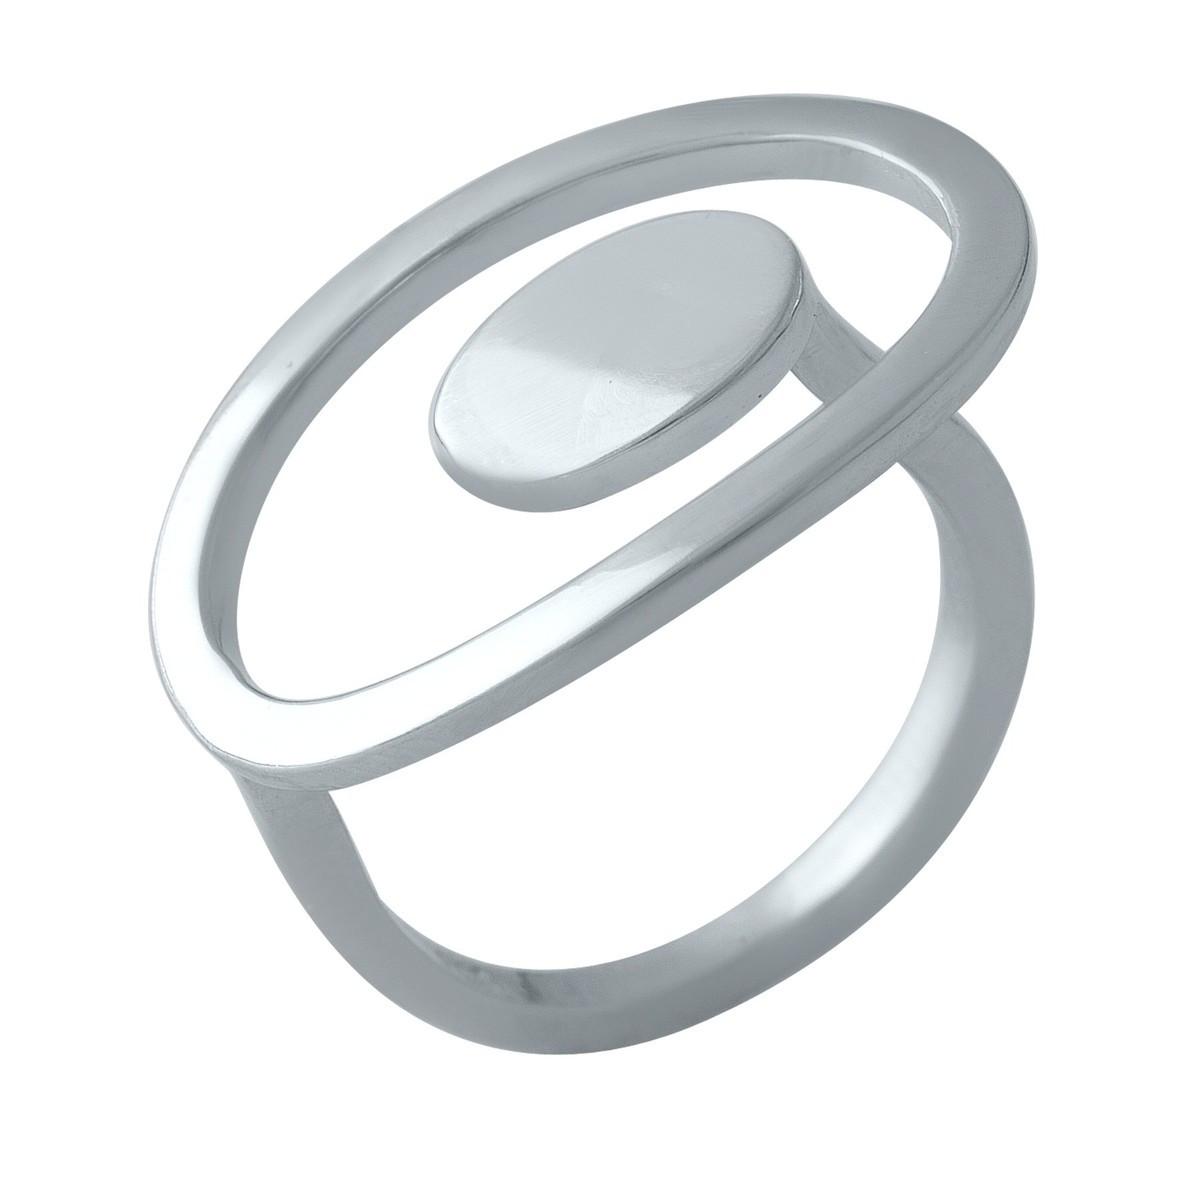 Серебряное кольцо pSilverAlex без камней (1998434) 18 размер